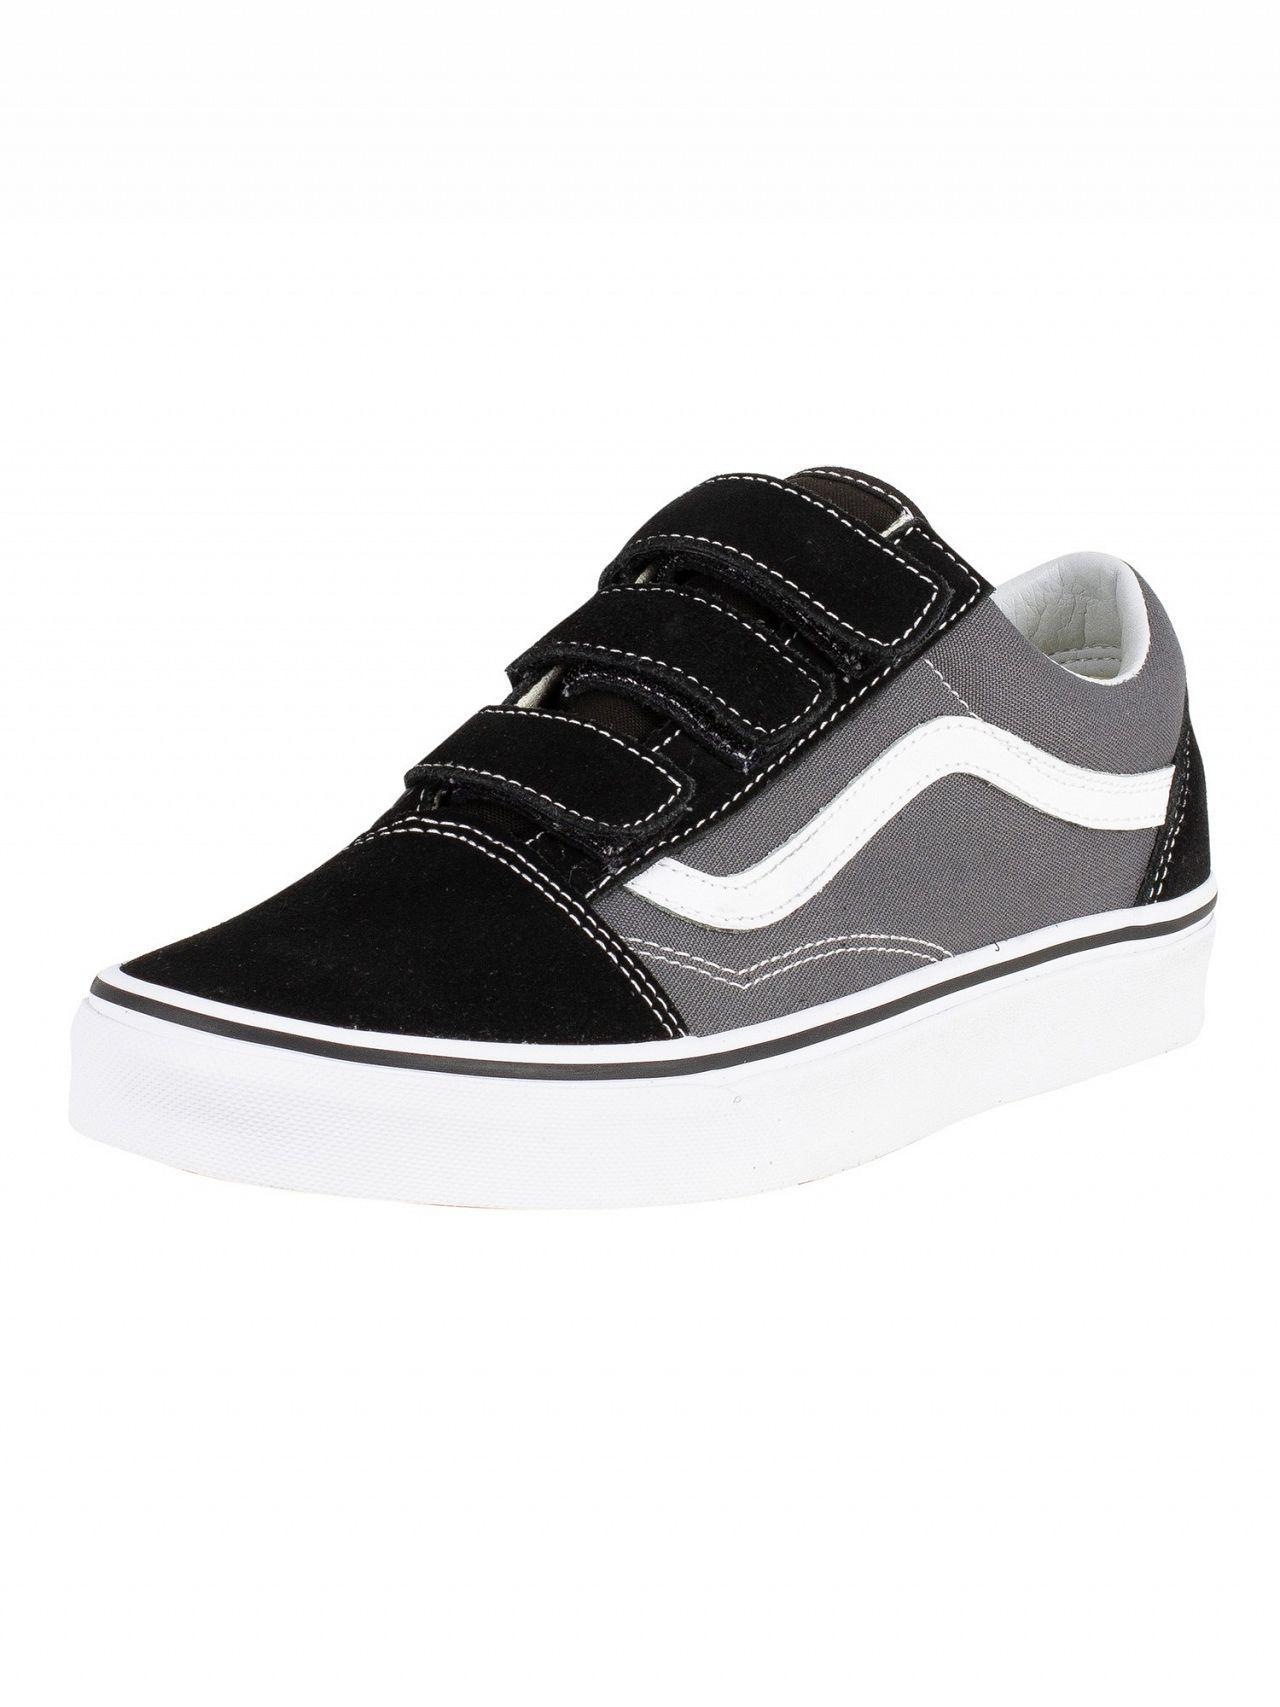 08ff16befa4 Vans Pewter black Old Skool V Trainers in Black for Men - Lyst